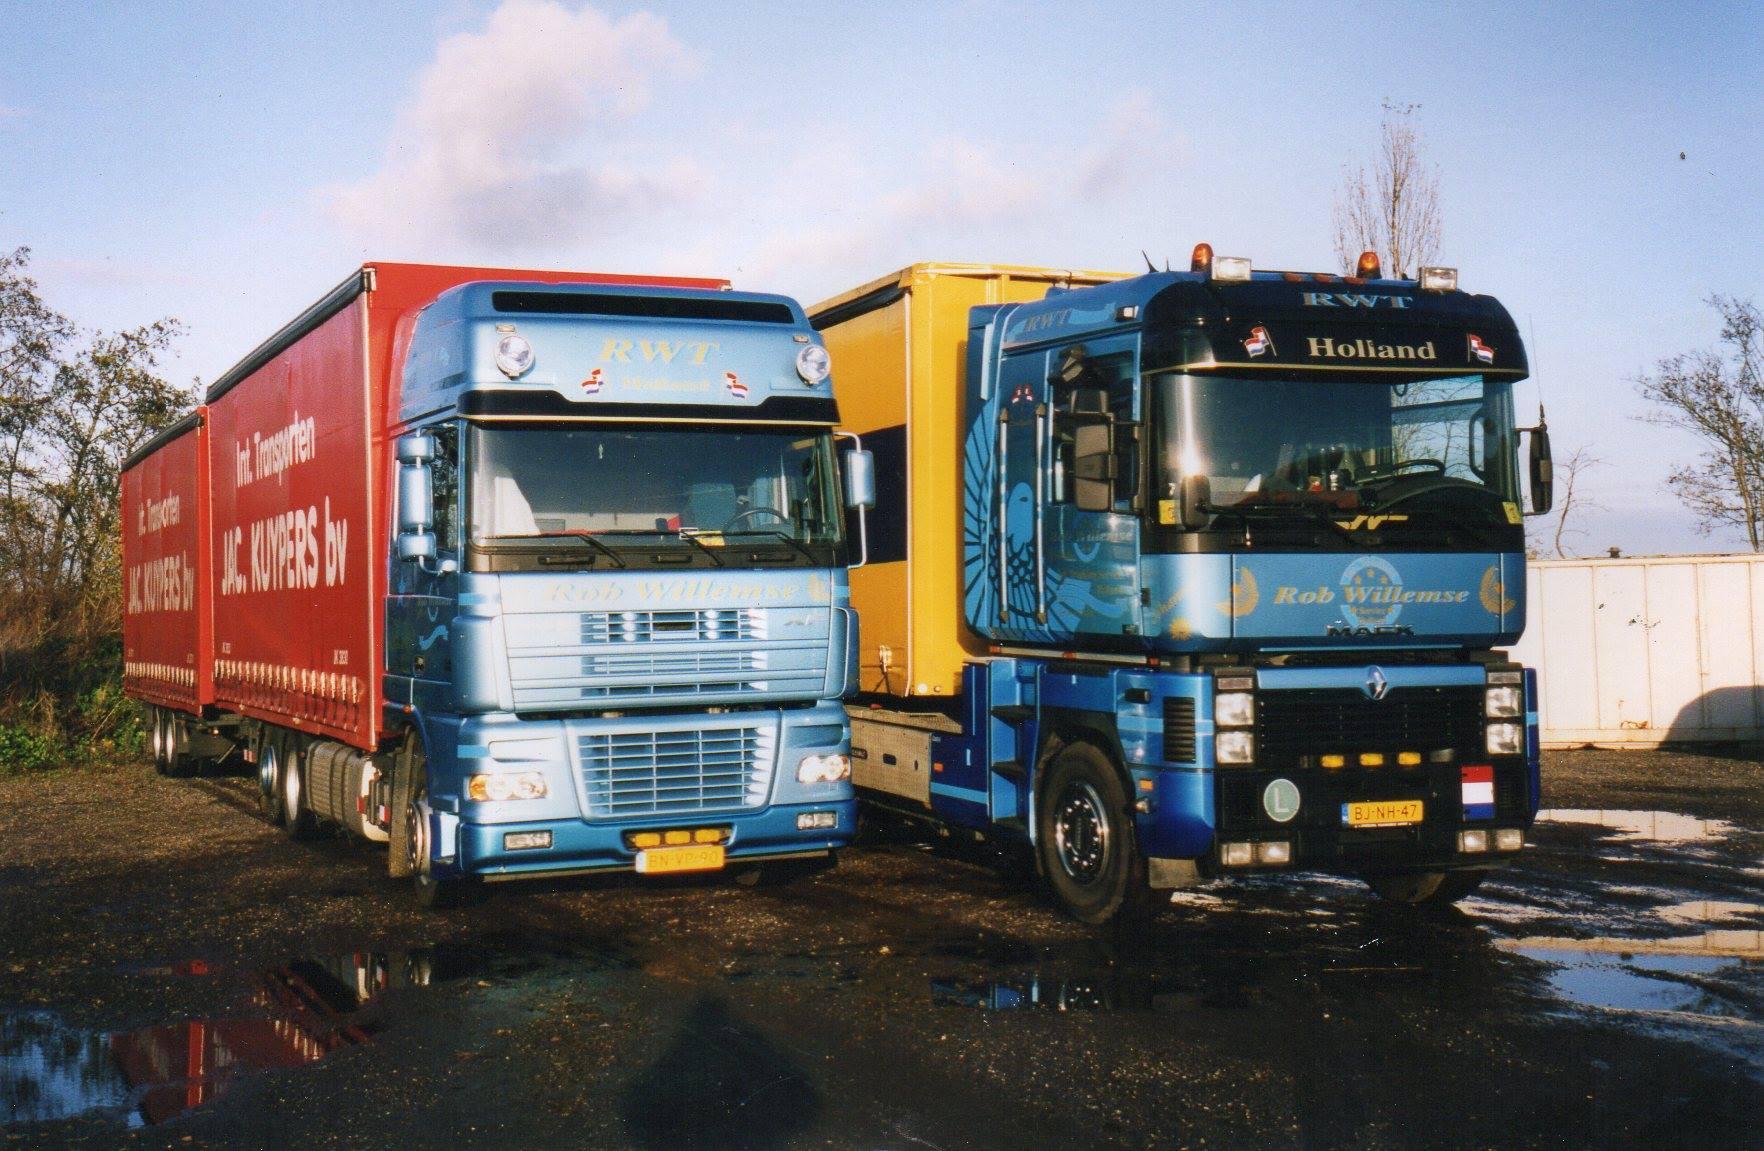 Rob-Willemse-Ittervoort